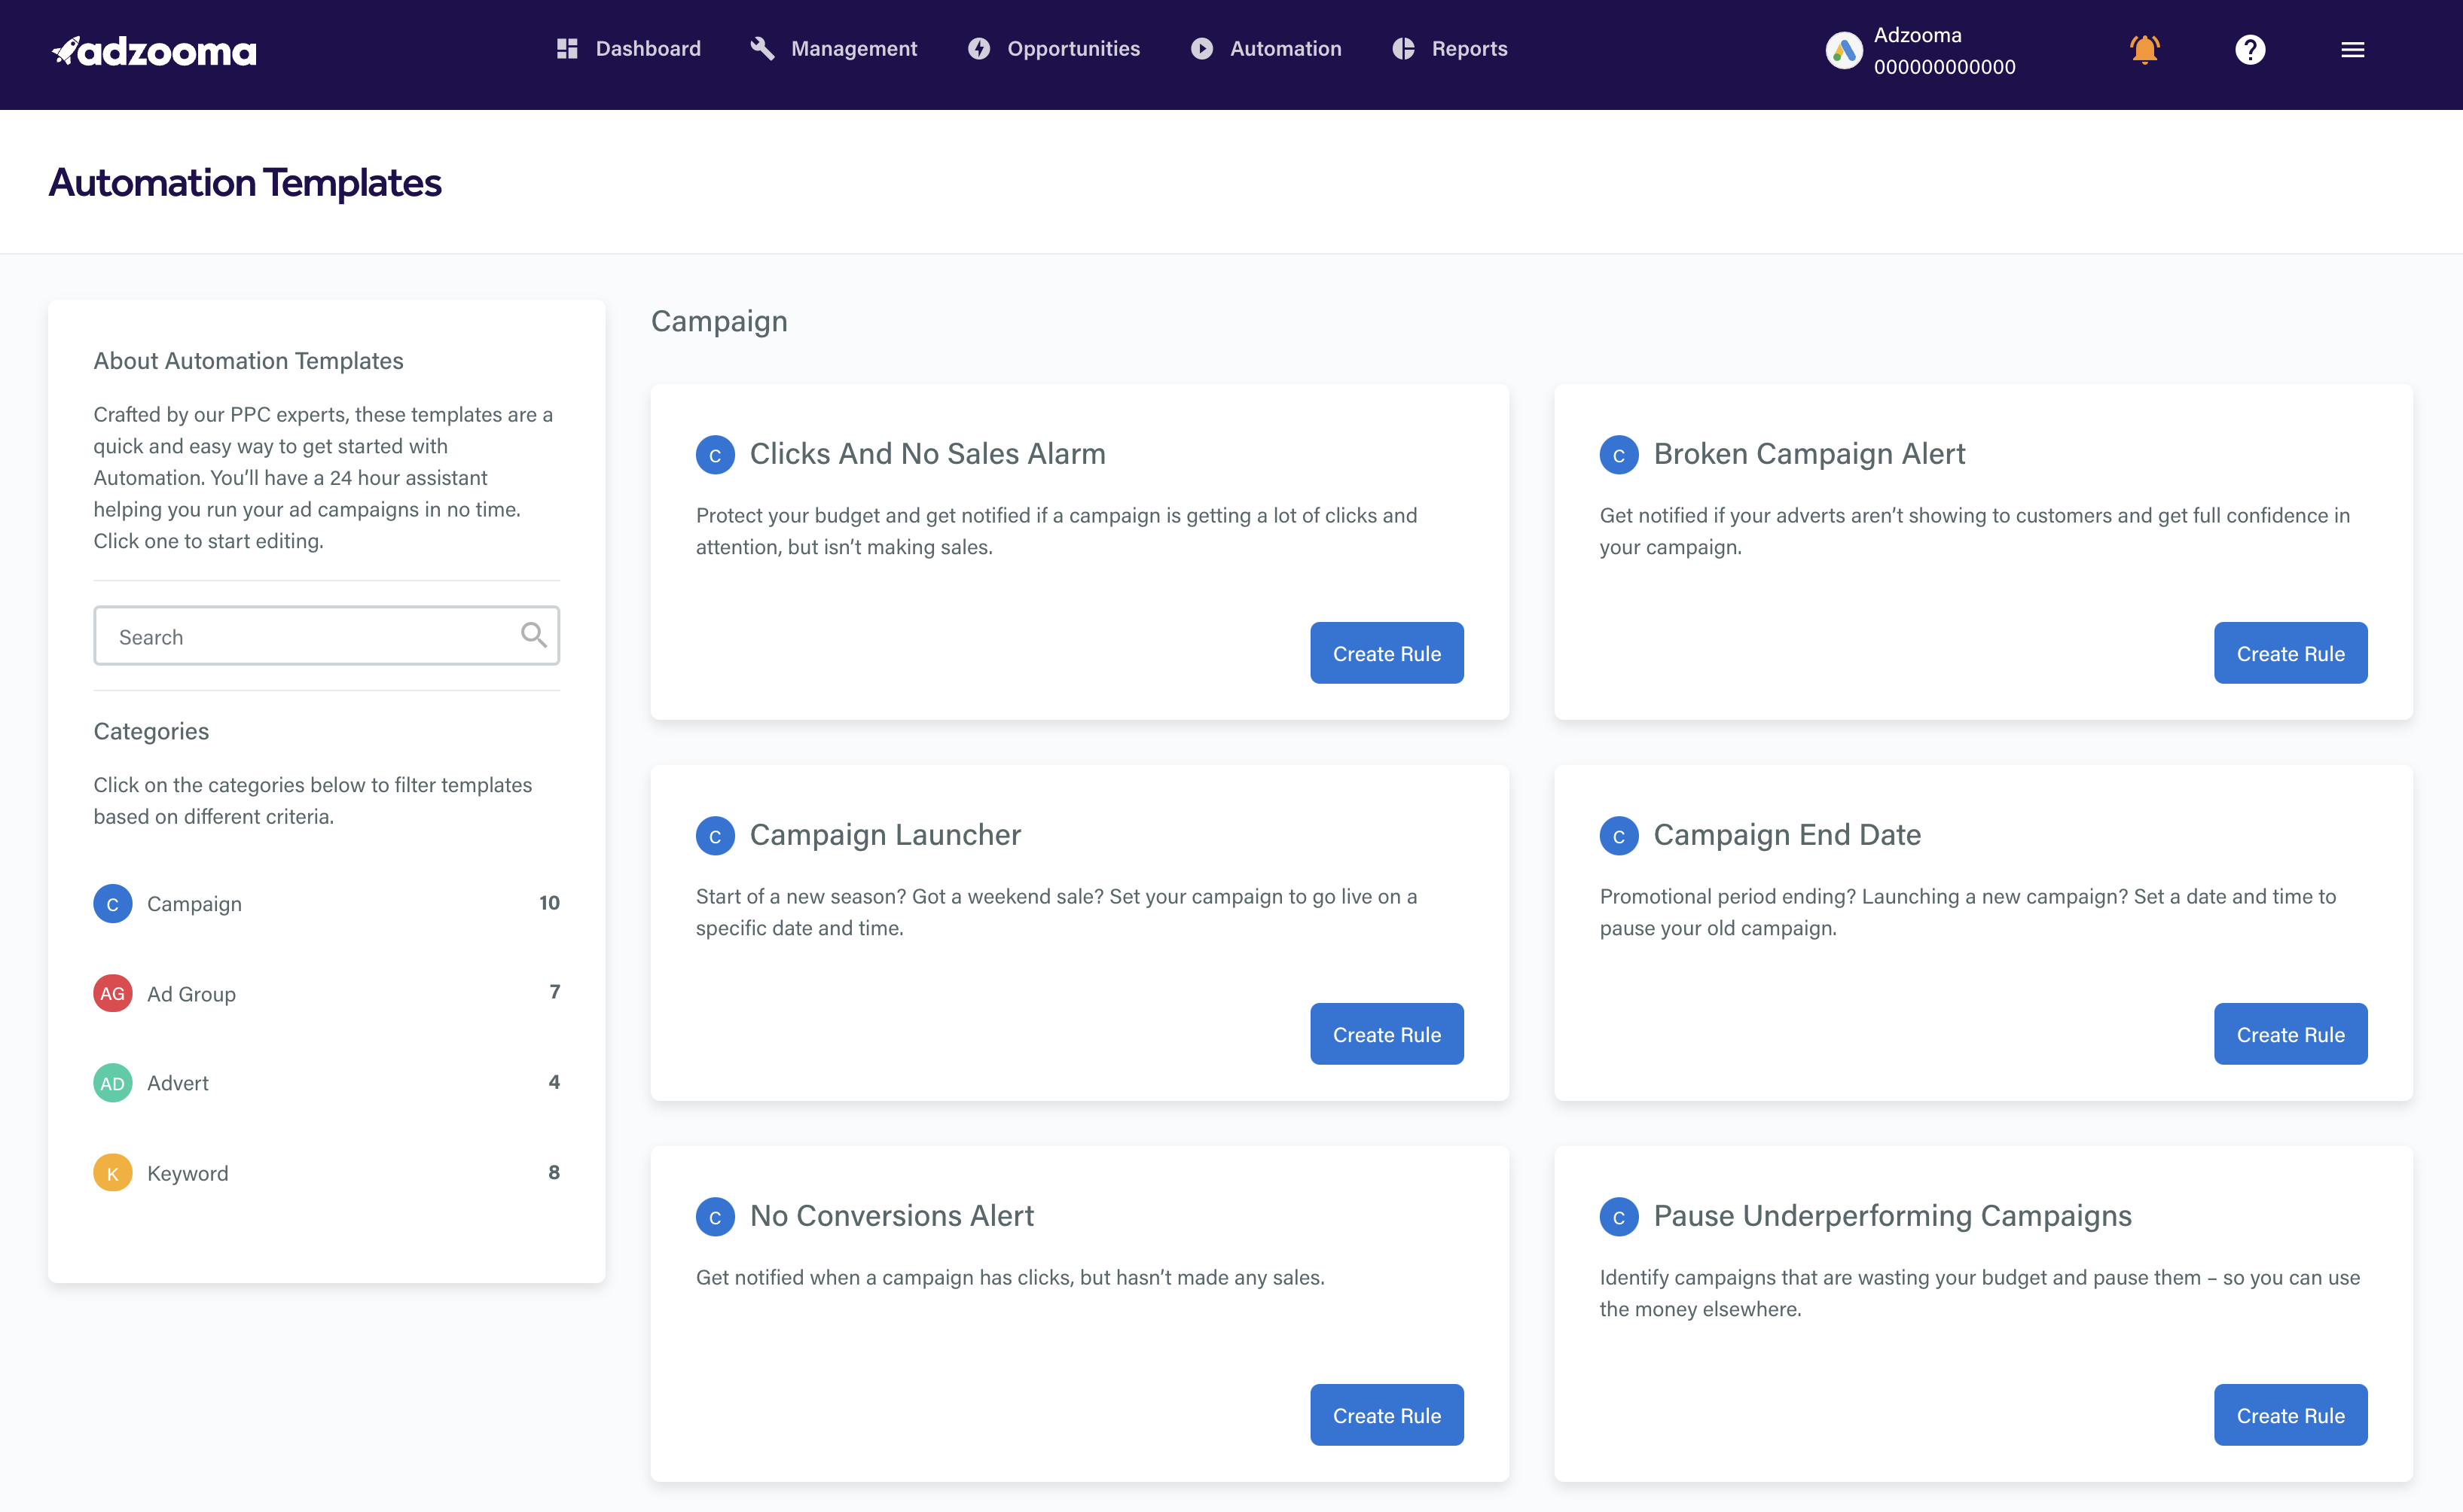 adzooma ppc management platform